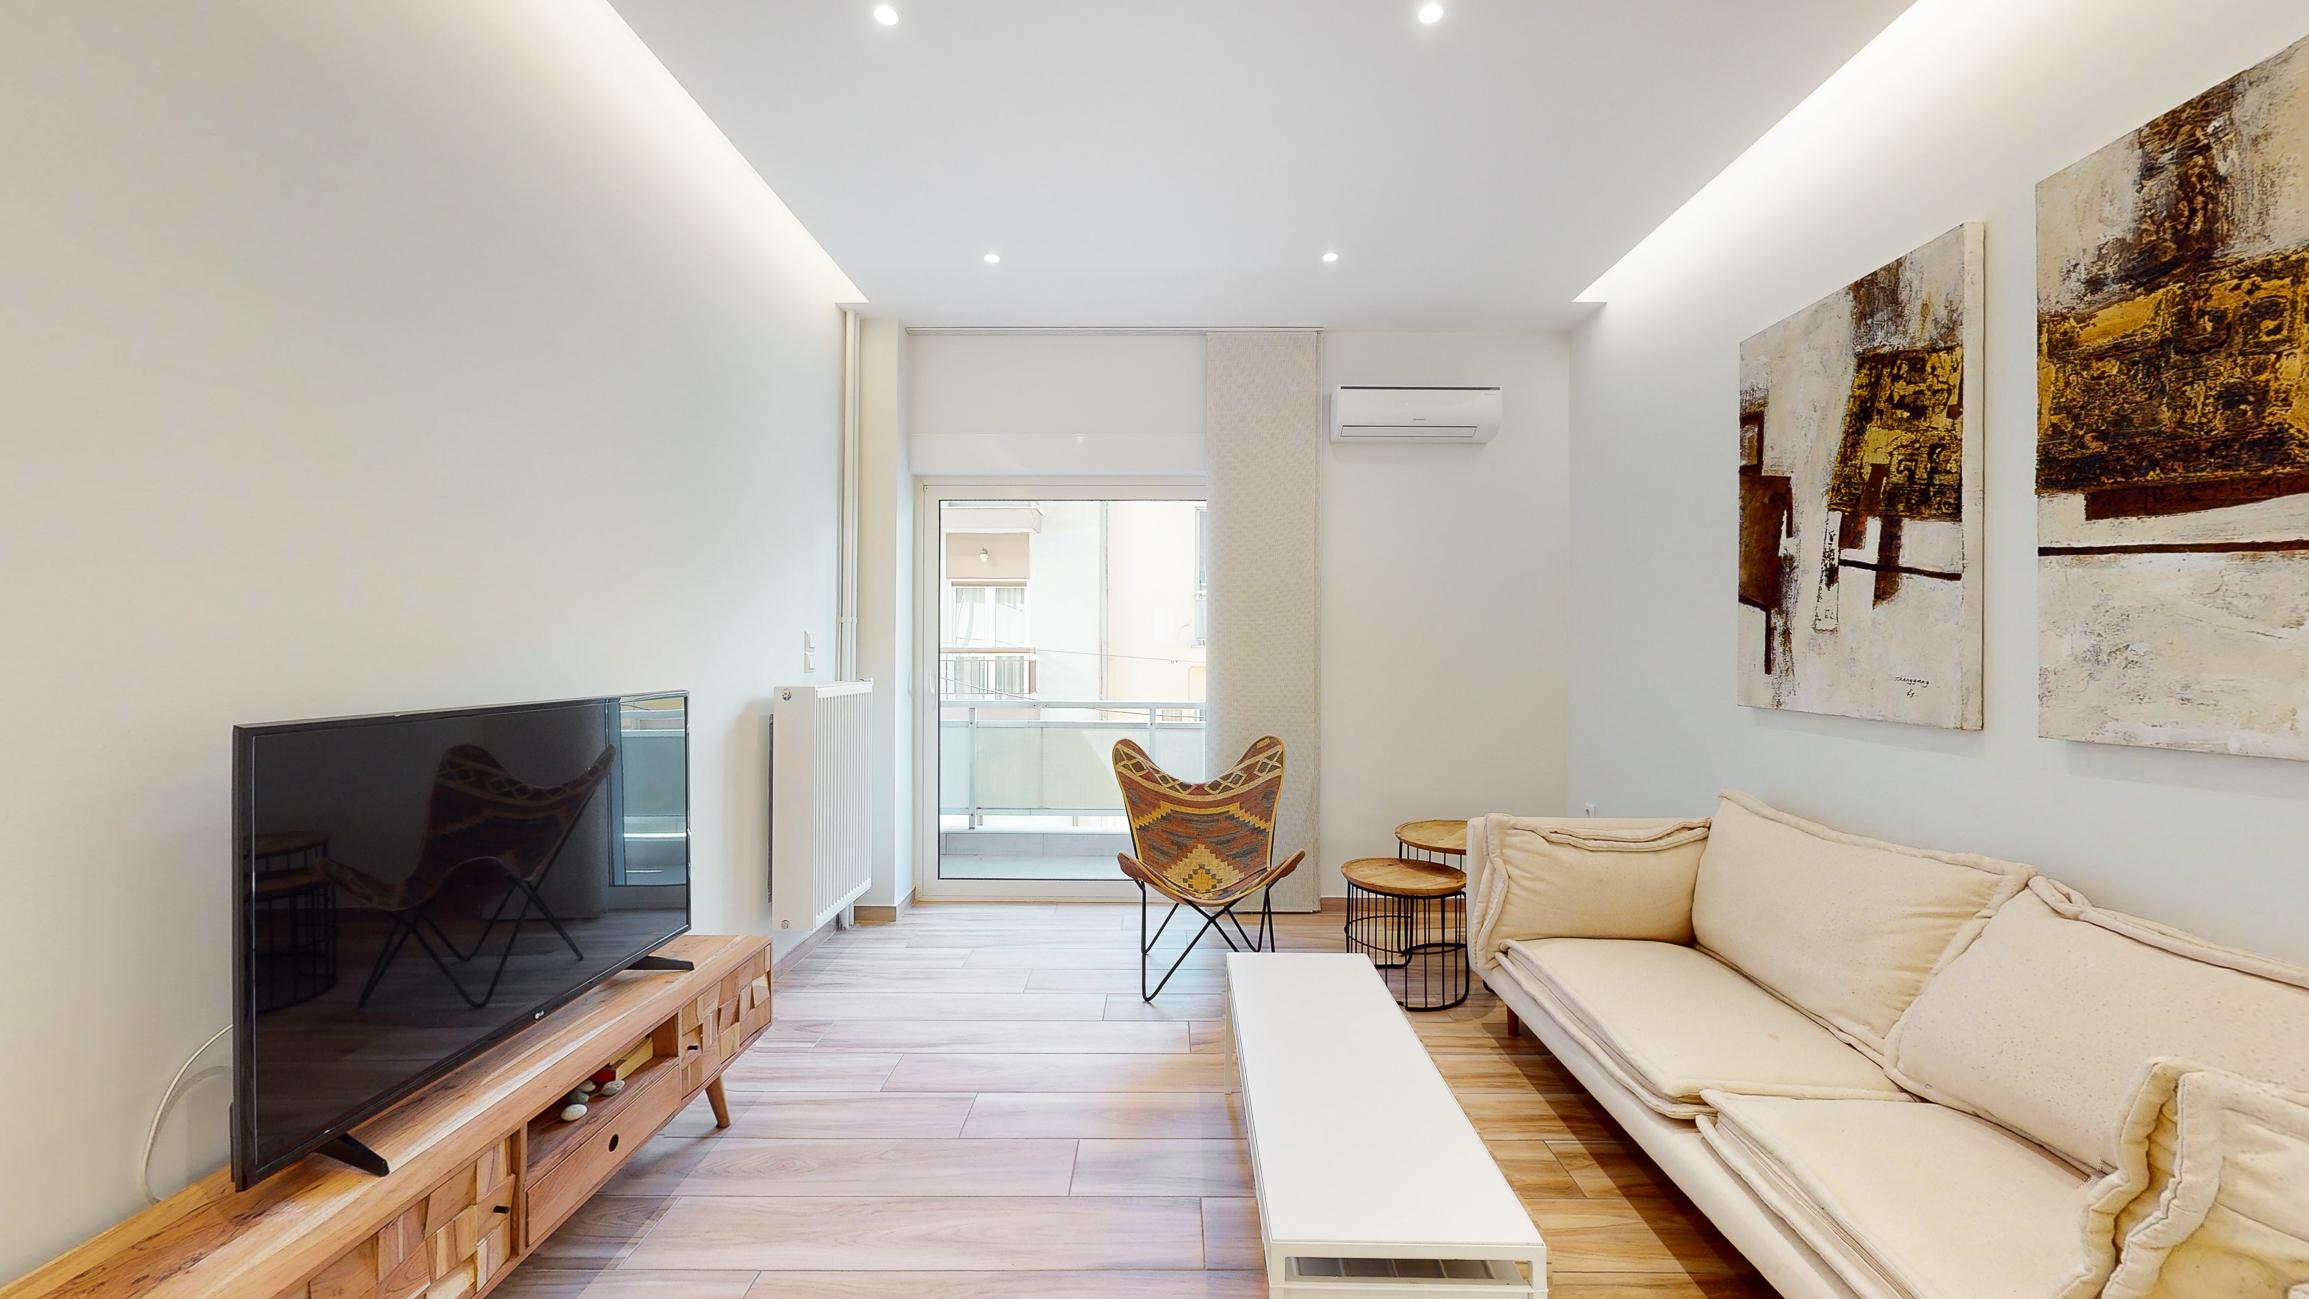 https://api.thebrik.com/static/properties/60339d5a11032b7788b6e42e/fb6e702d.living-room.1.jpg